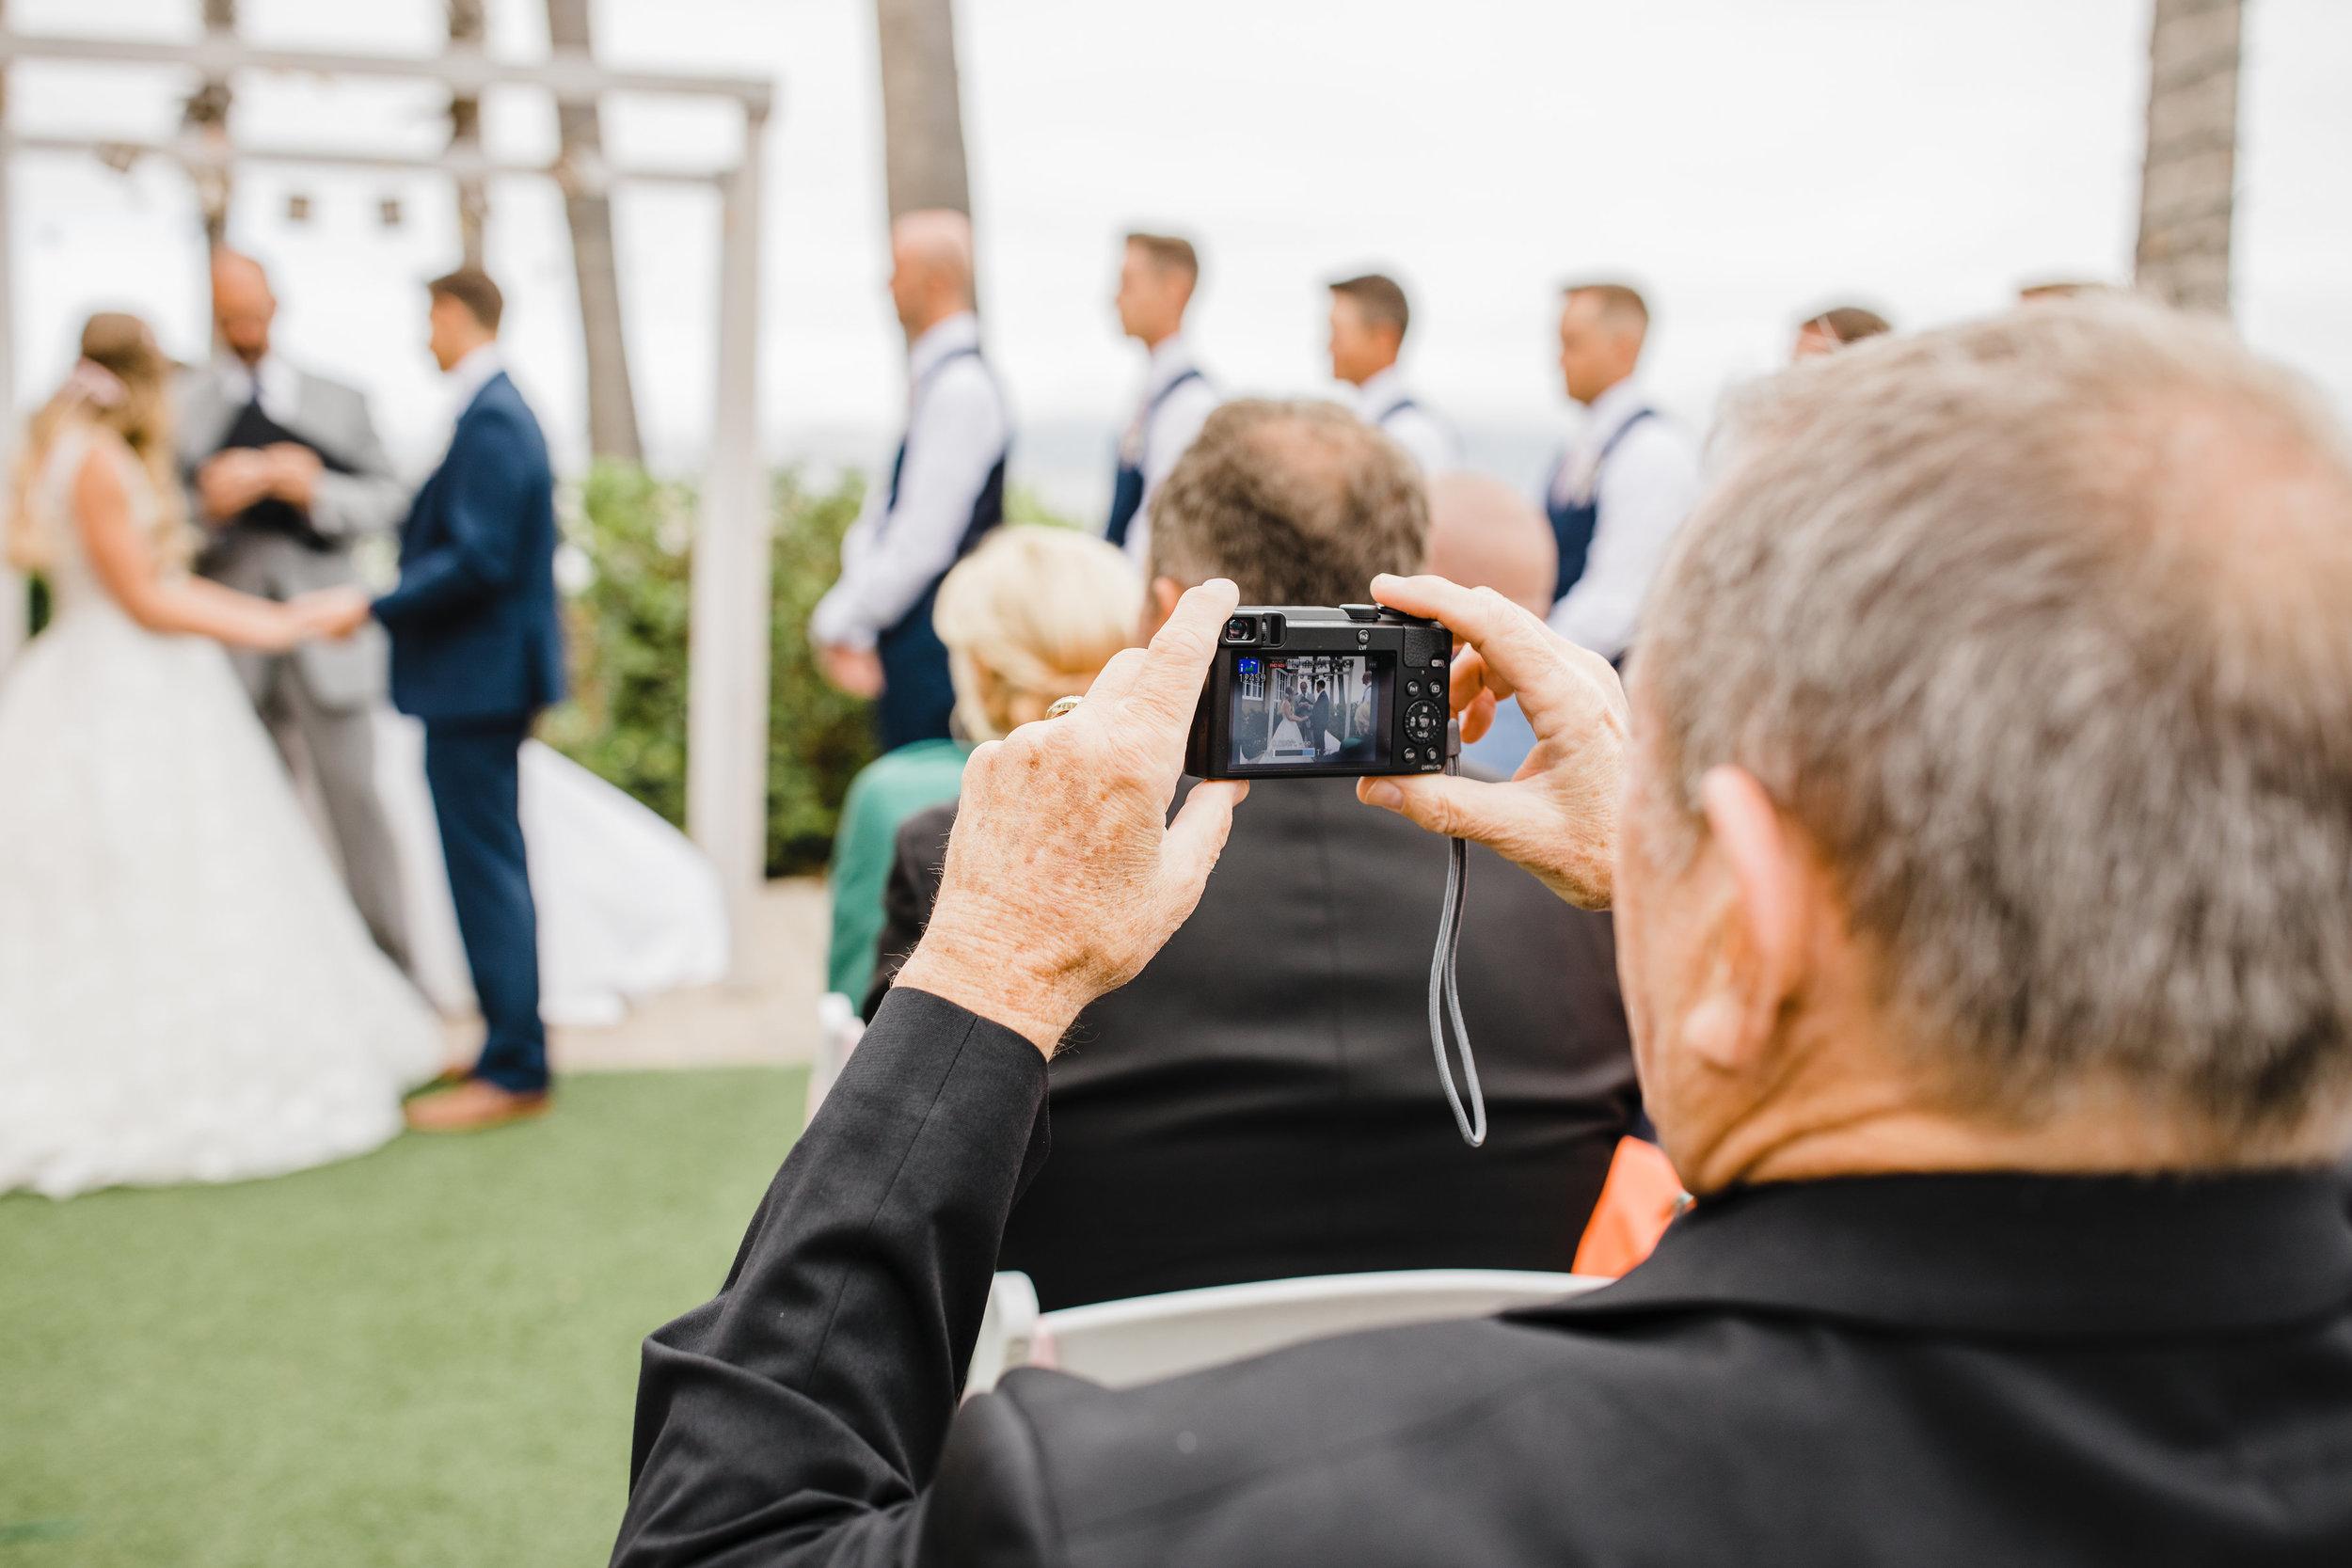 park city wedding photographer outdoor beach wedding groomsman vests wedding guests wedding ceremony